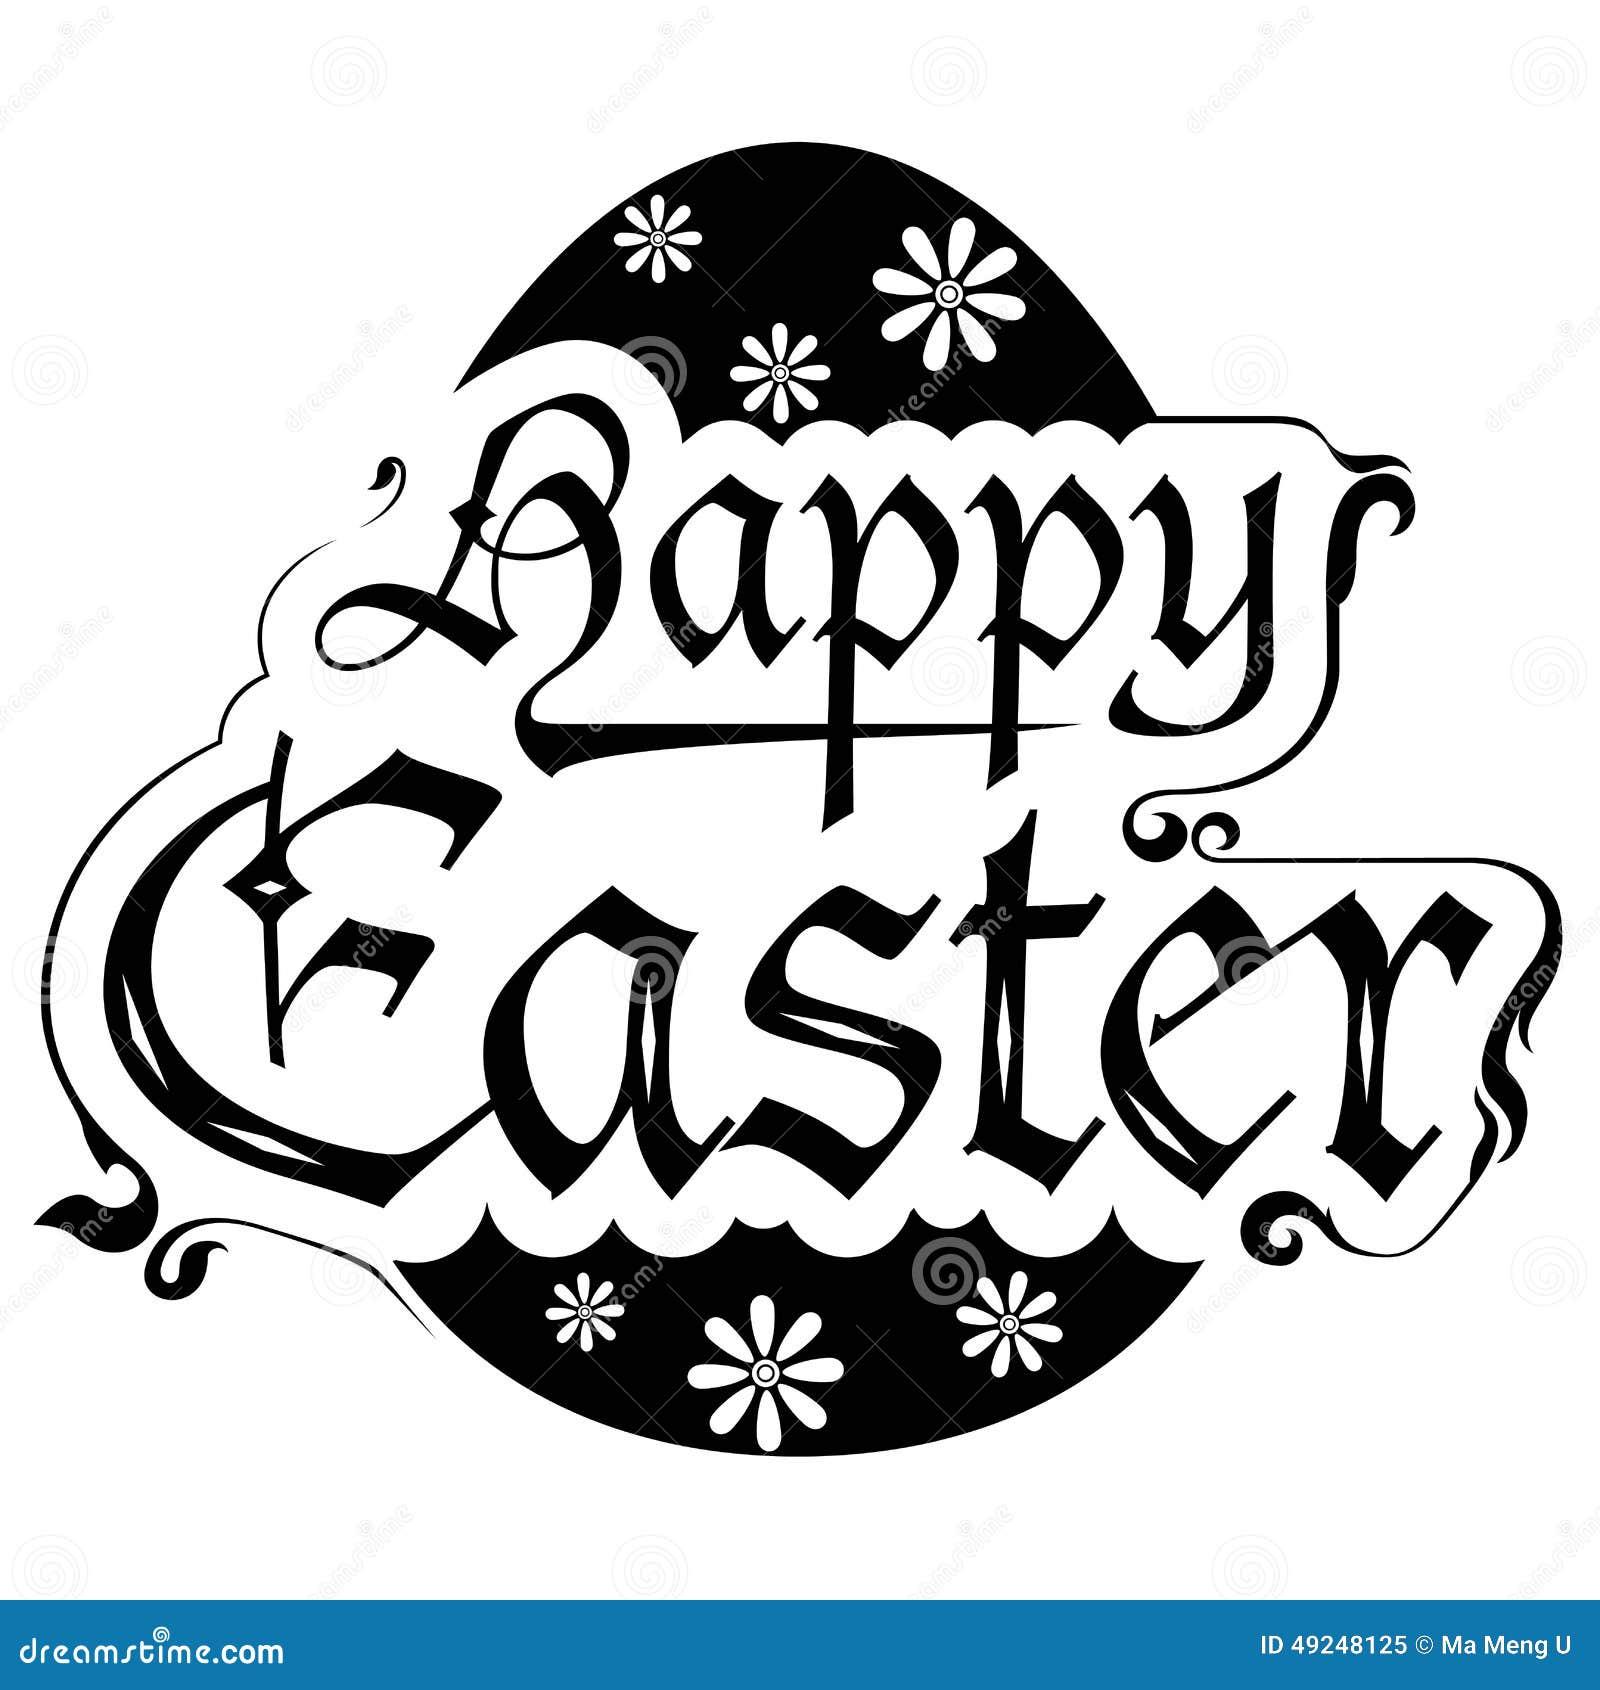 Happy Easter Design Element Stock Vector Image 49248125